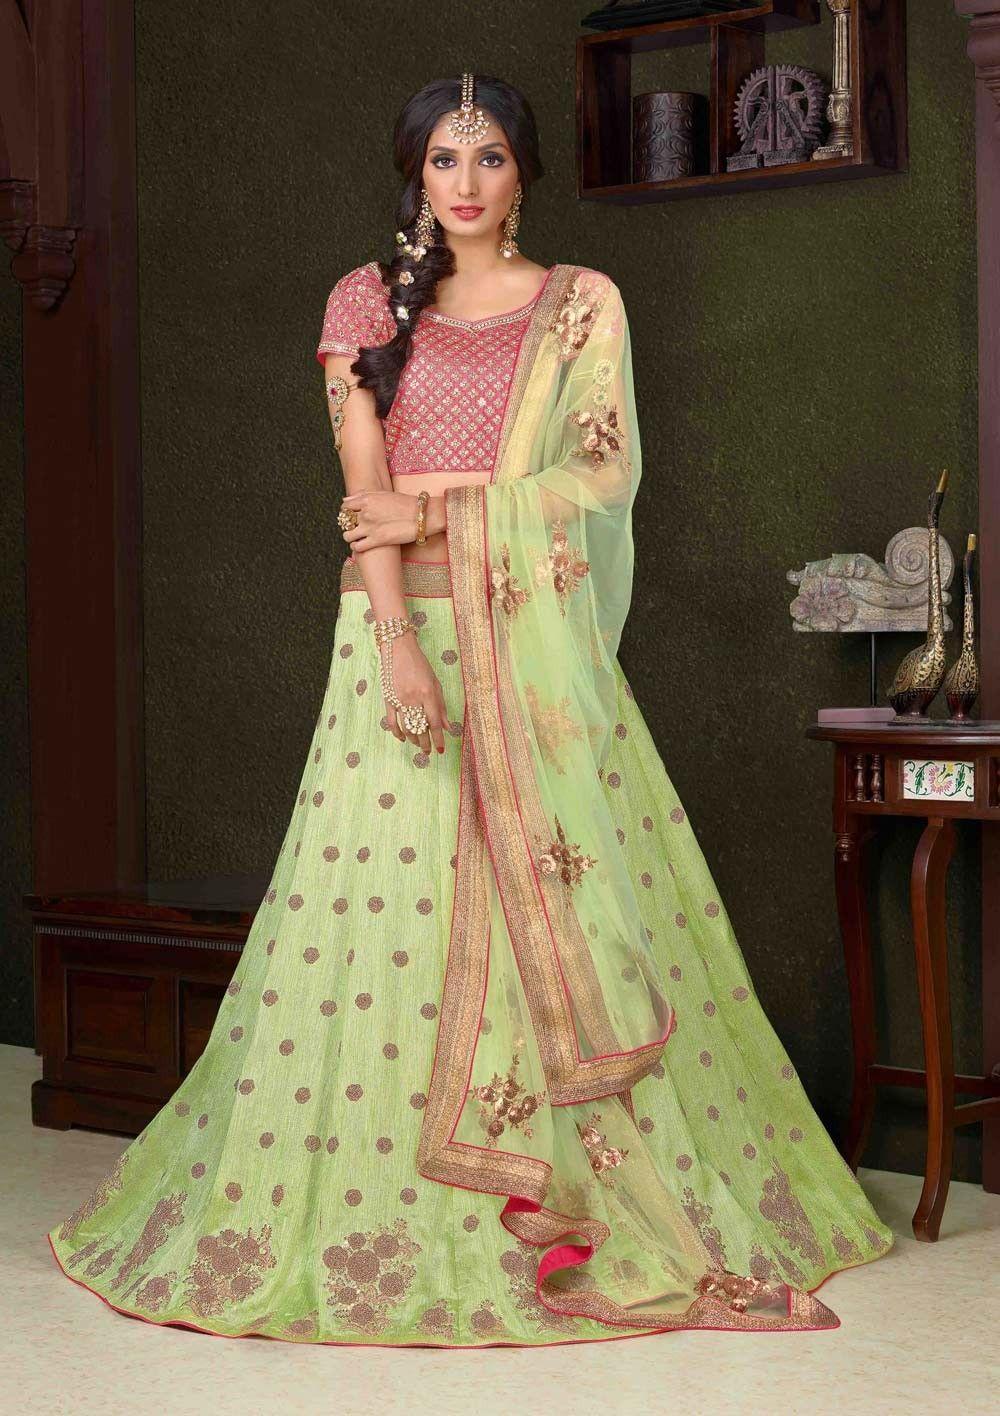 Clothing, Shoes & Accessories Provided Green Bollywood Indian Partywear Lehenga Lengha Choli Pakistani Wedding Sari Reasonable Price Other Women's Clothing